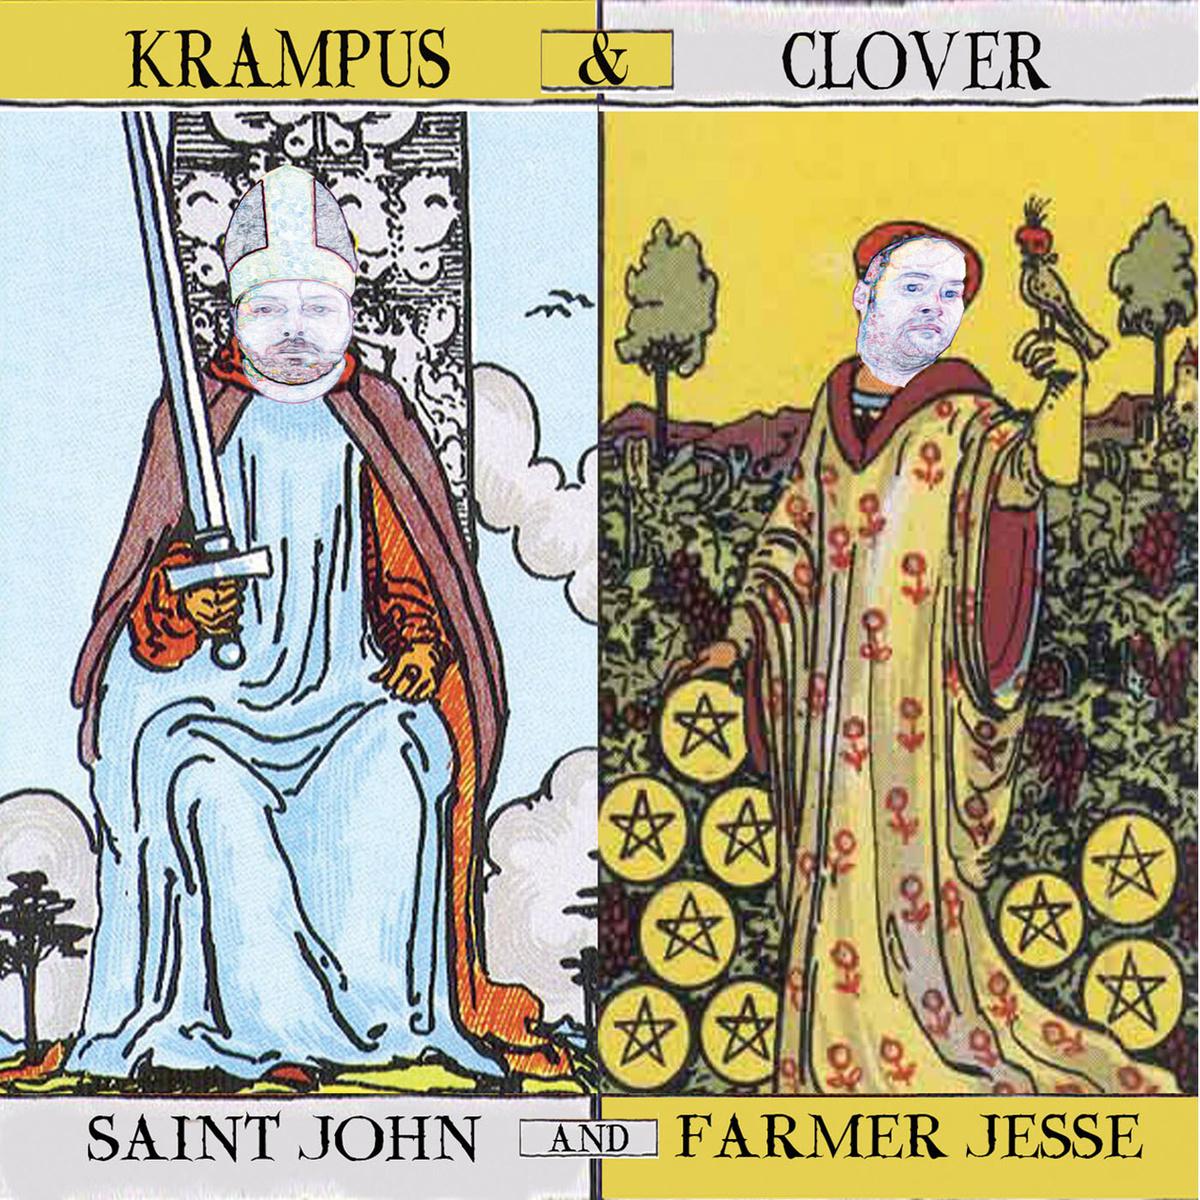 Saint John and Farmer Jesse